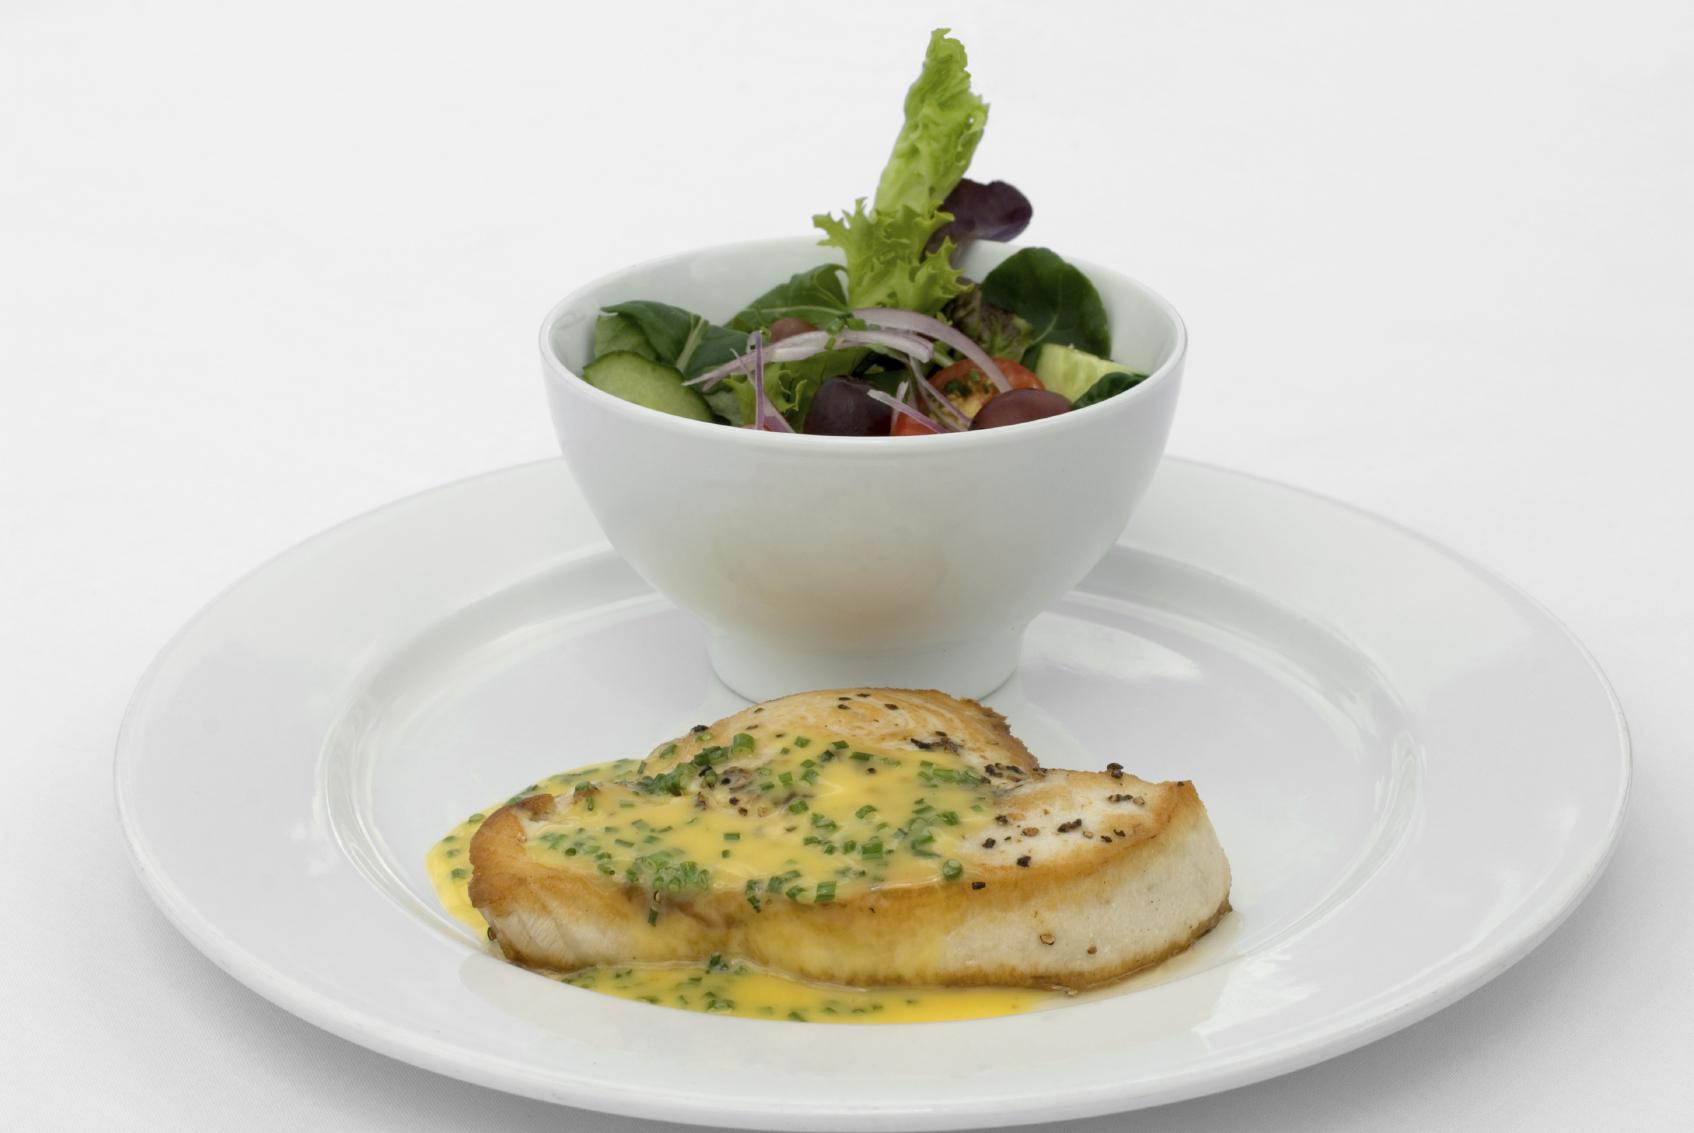 Swordfish, lemon and herbs